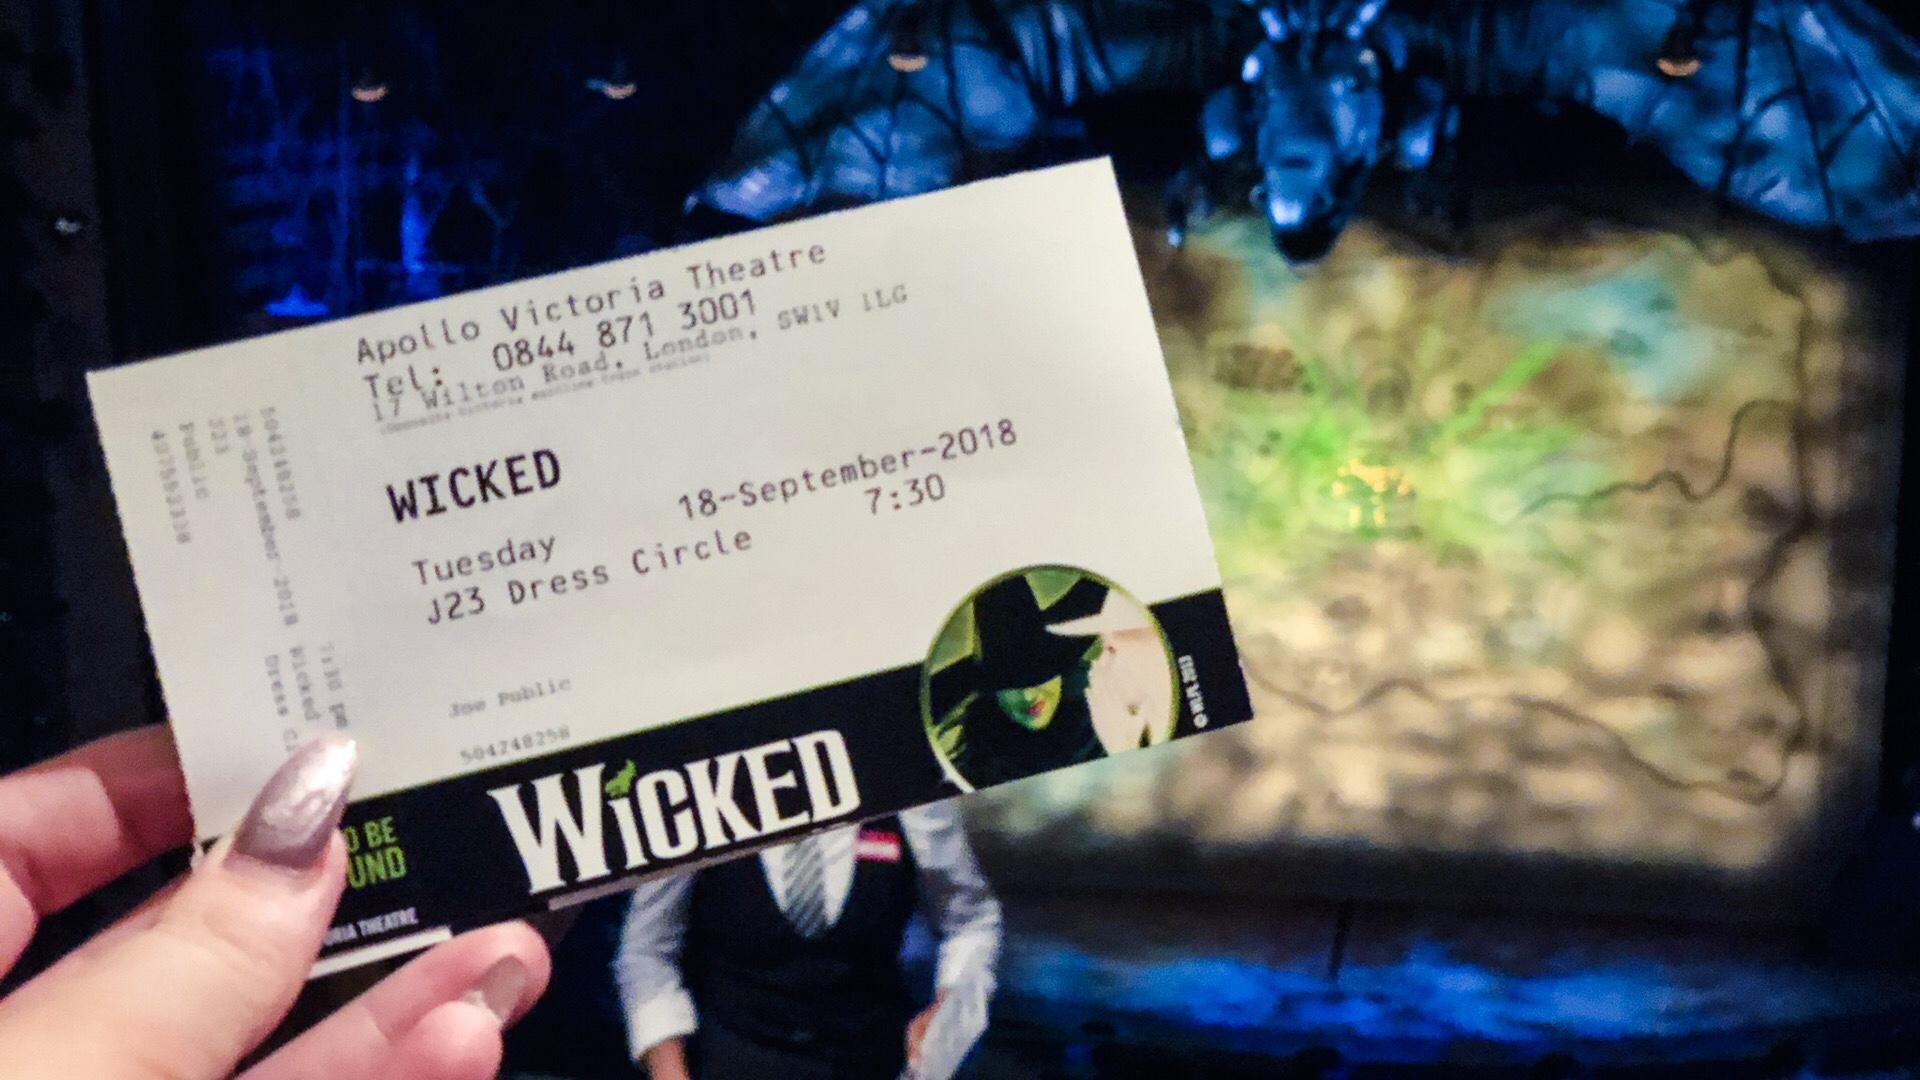 Wicked at the Apollo Victoria Theatre, Review    London